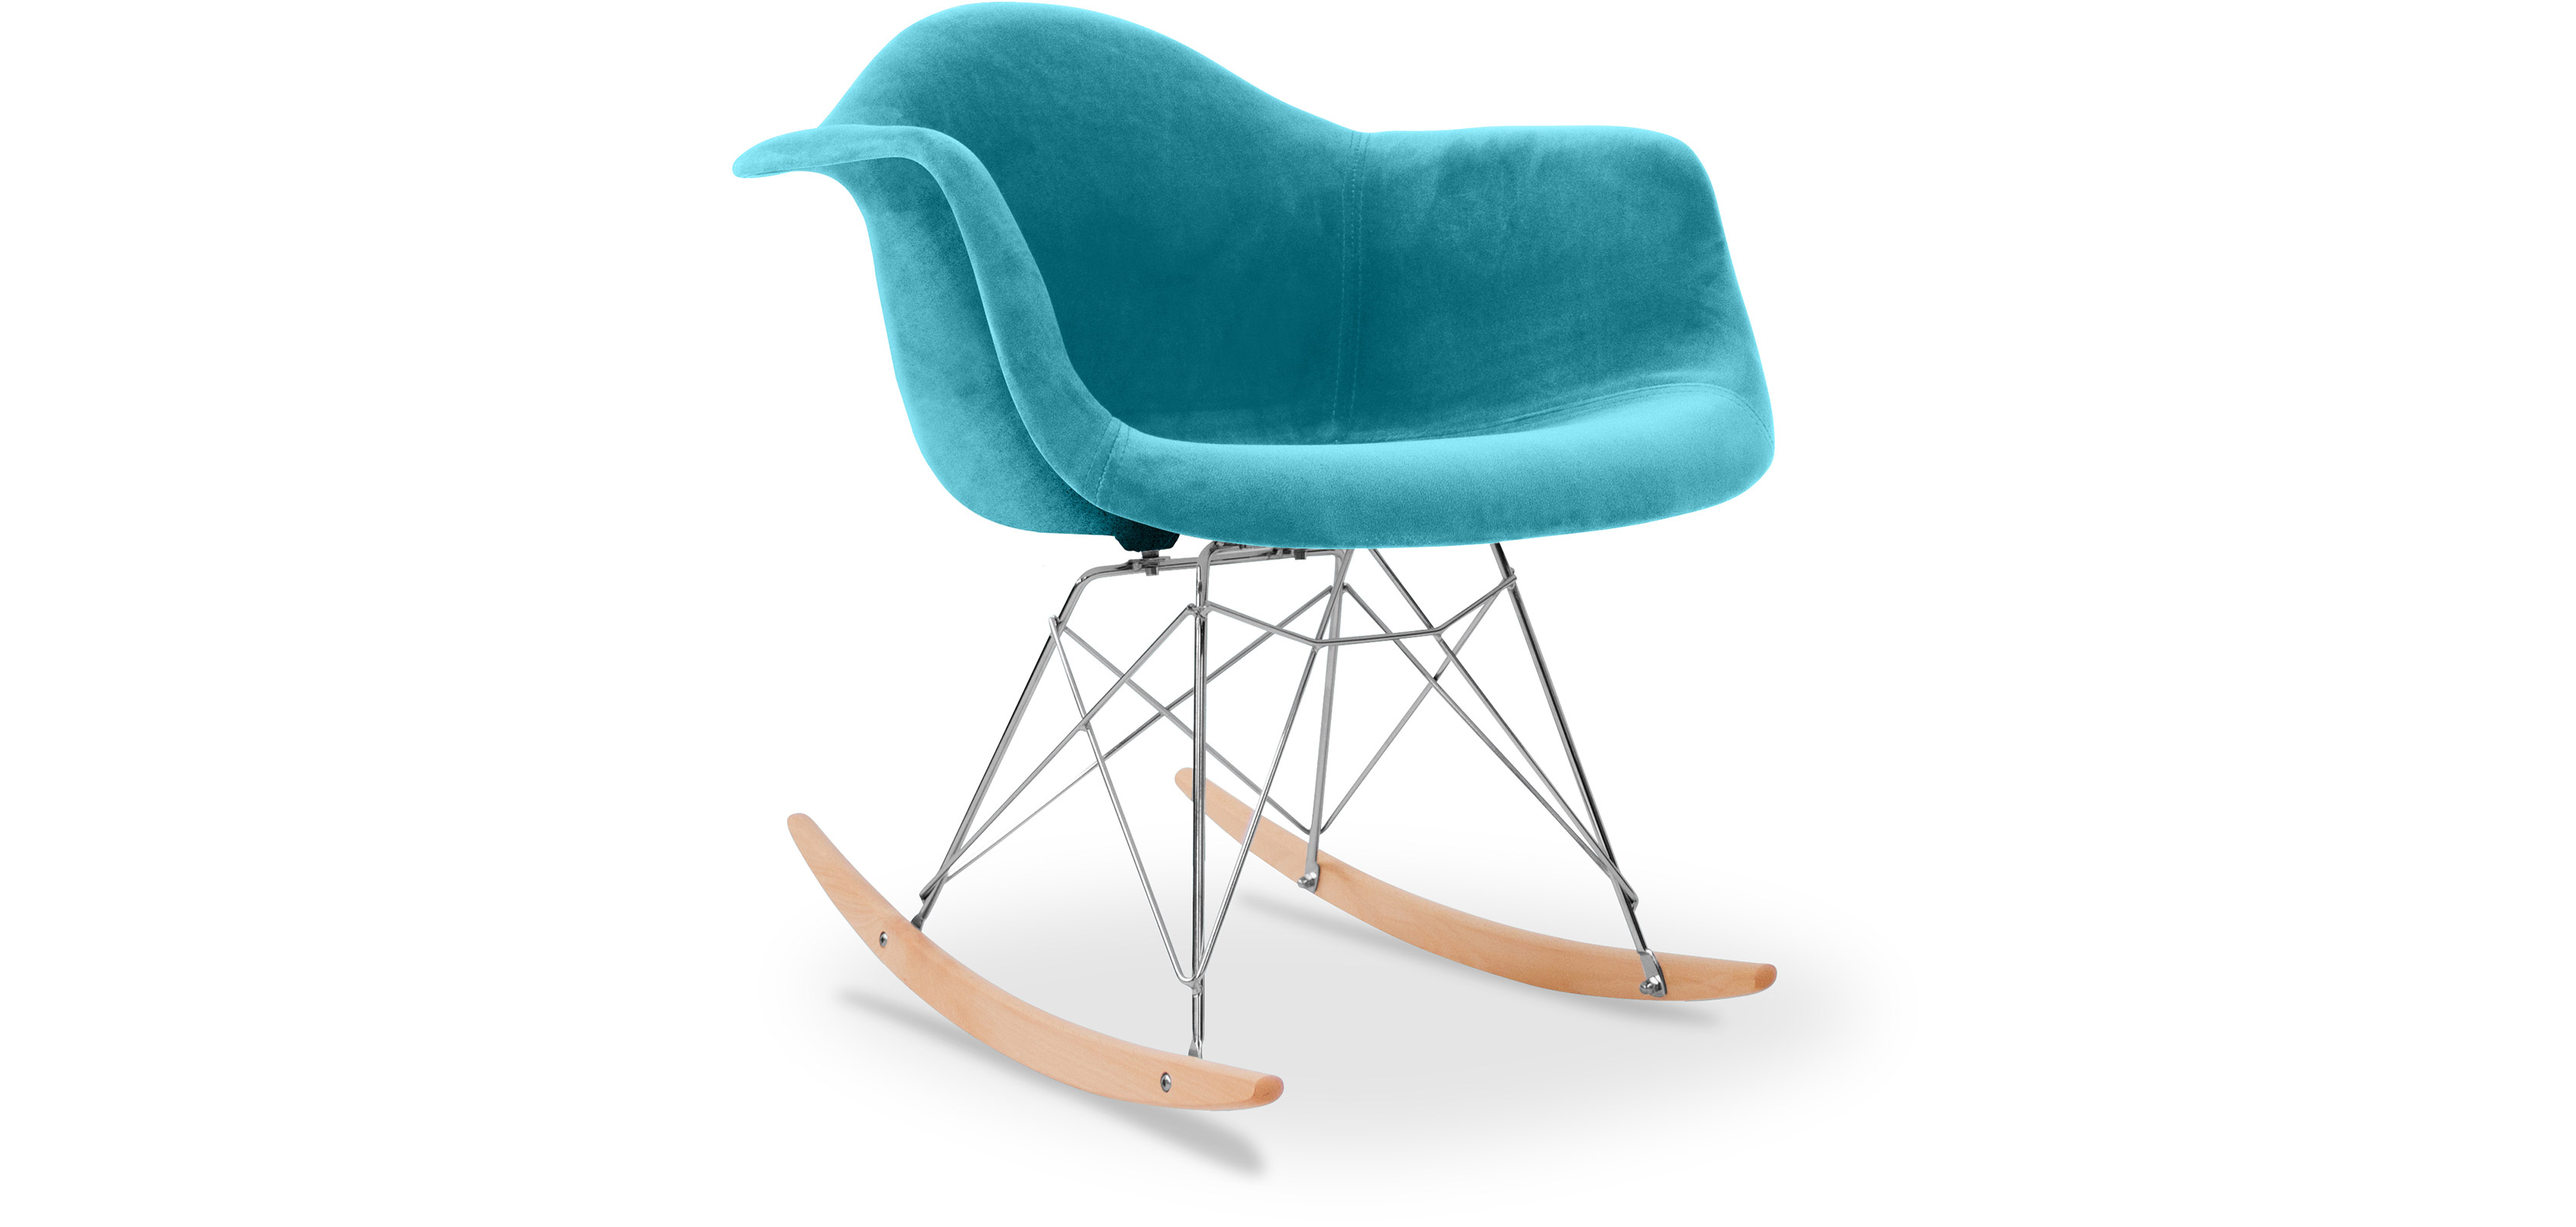 rar schaukelstuhl charles eames. Black Bedroom Furniture Sets. Home Design Ideas